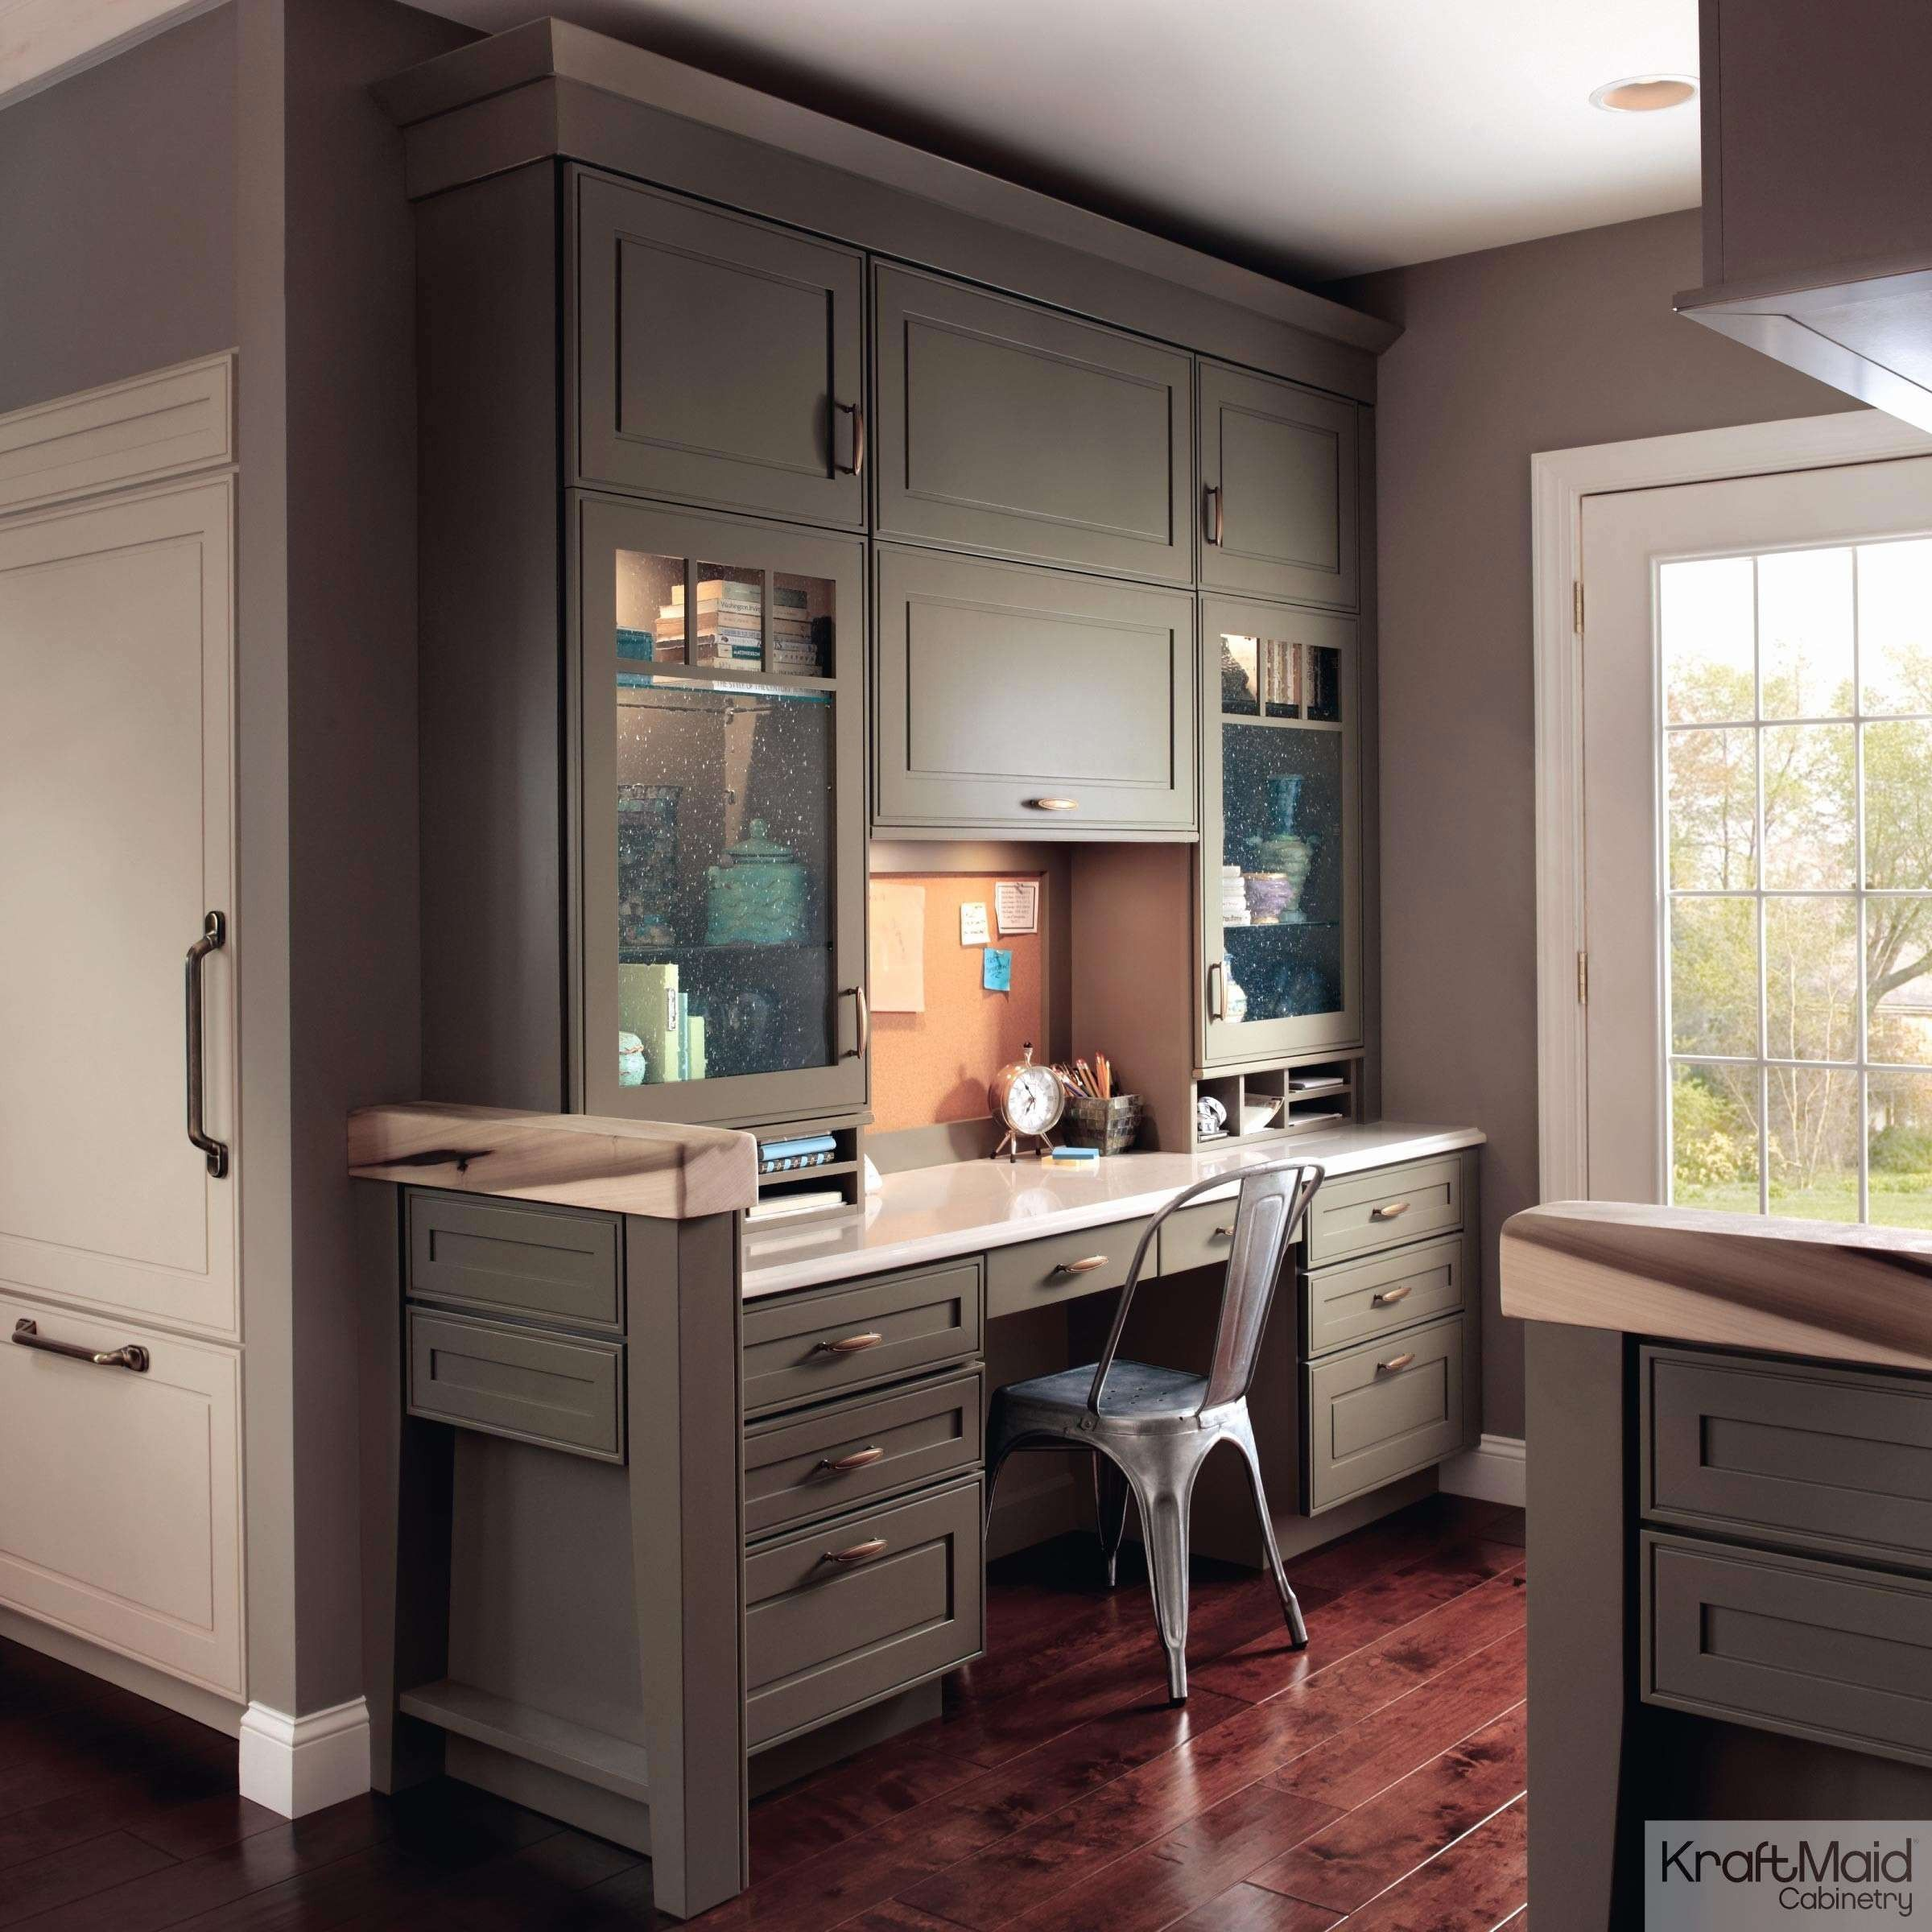 Inspirational Kitchen Cabinets Costco Cabinet Desain Rumah Rumah